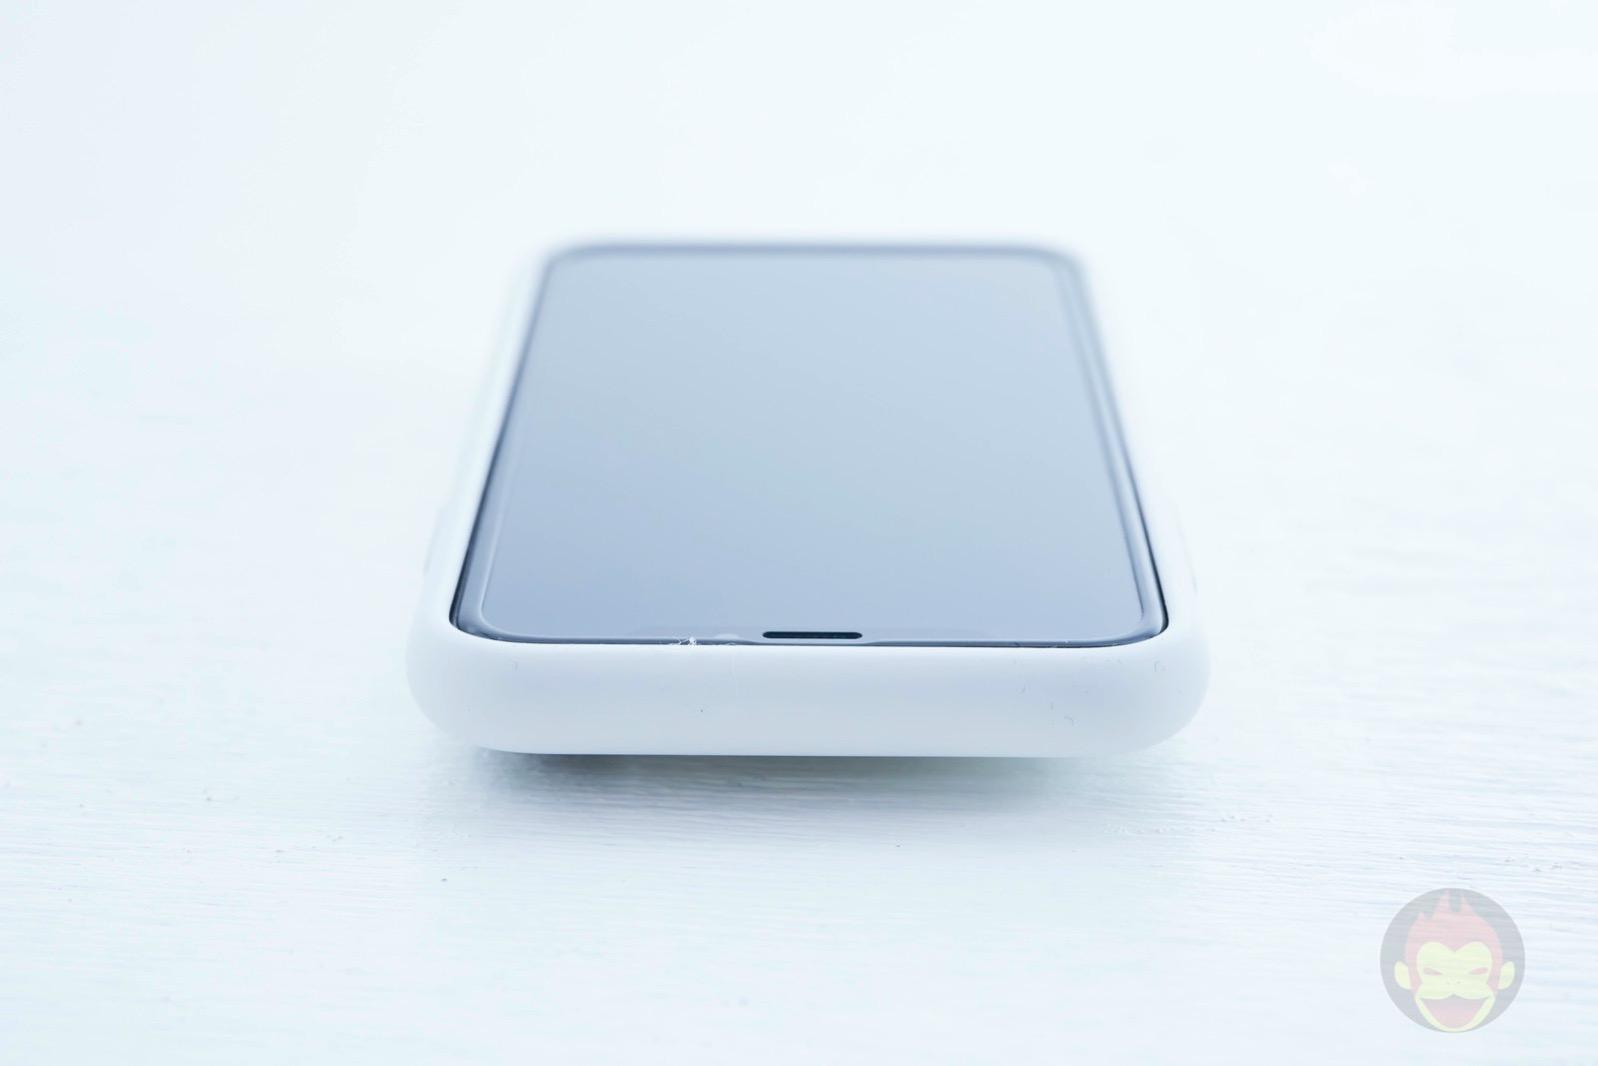 Smart-Battery-Case-for-iPhoneXS-Review-06.jpg